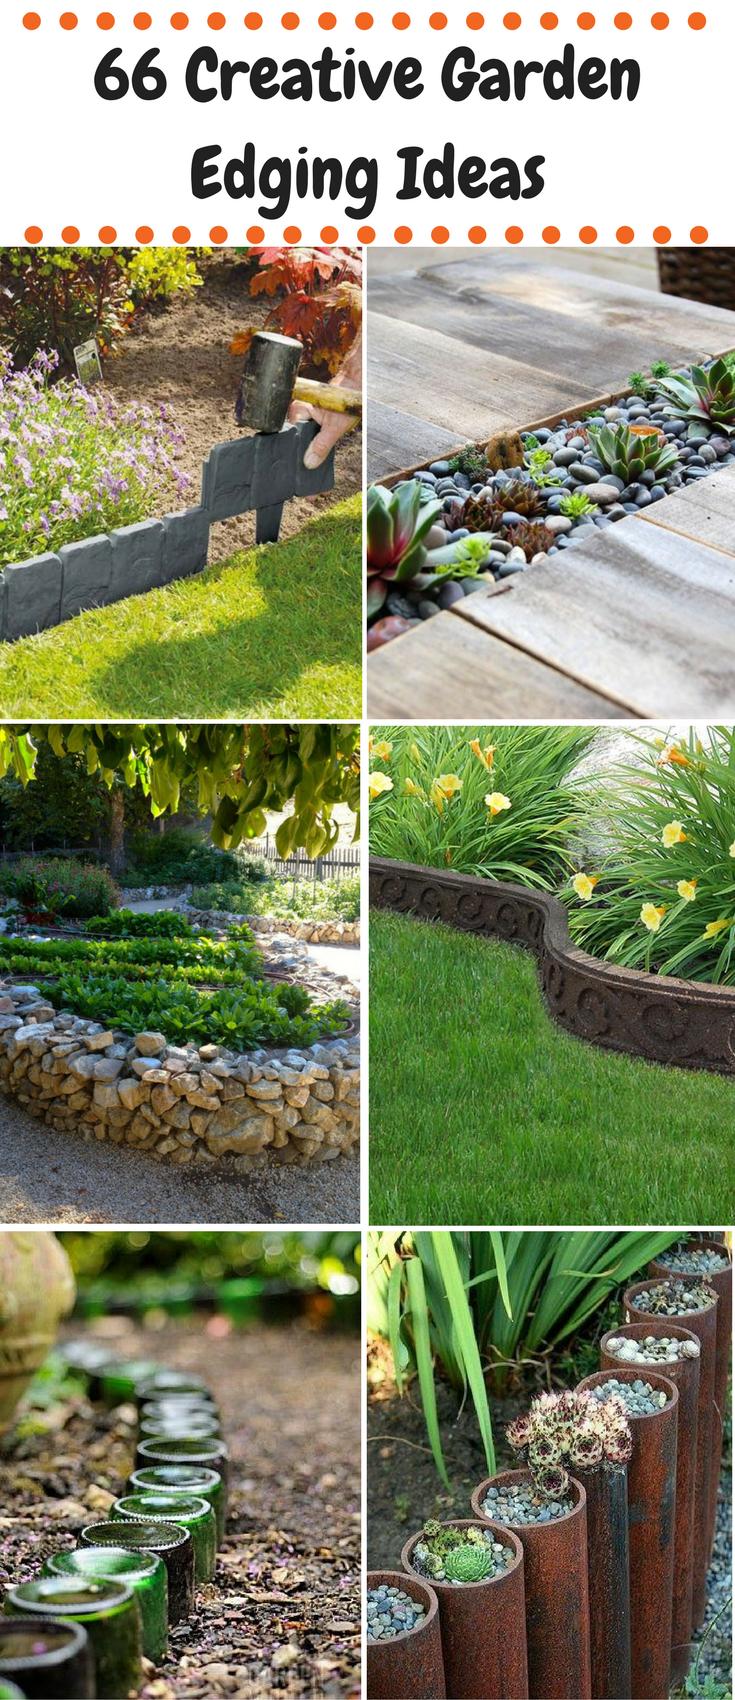 Attirant 66 Creative Garden Edging Ideas   Using Rocks, Hoses, Wine Bottles, Metal  Wheels